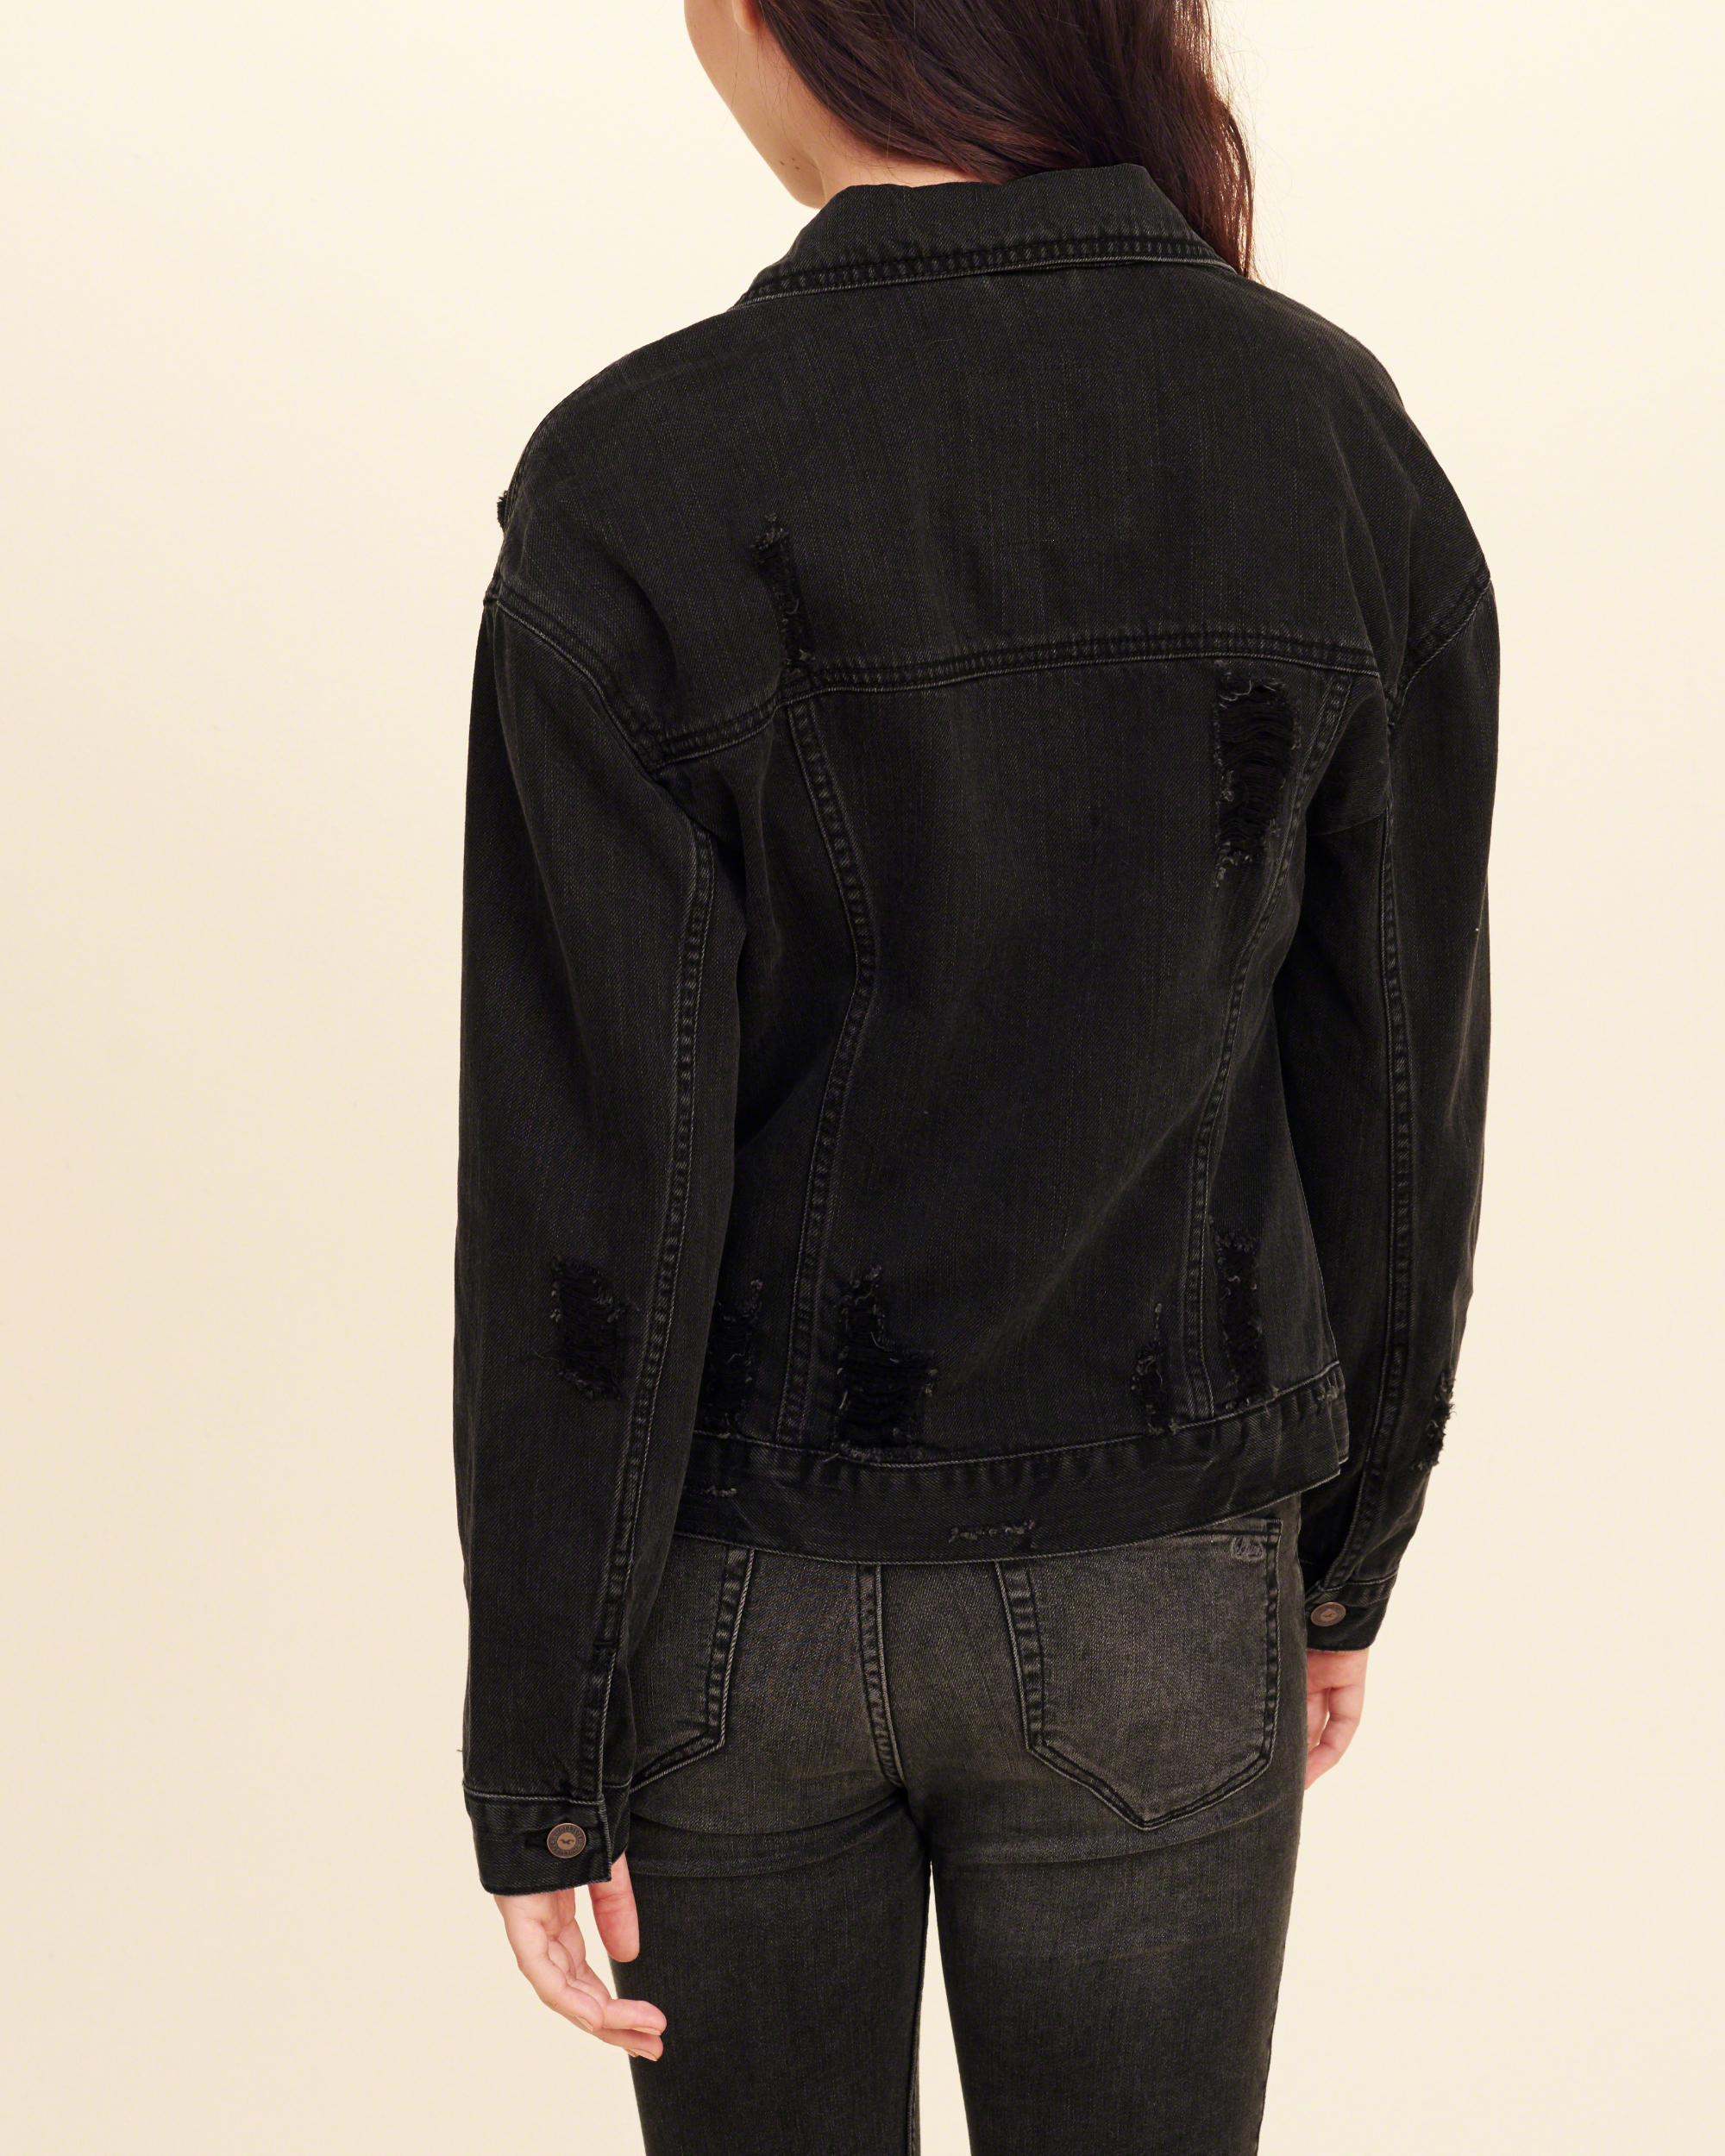 Lyst - Hollister Sherpa-lined Oversized Denim Jacket in Black